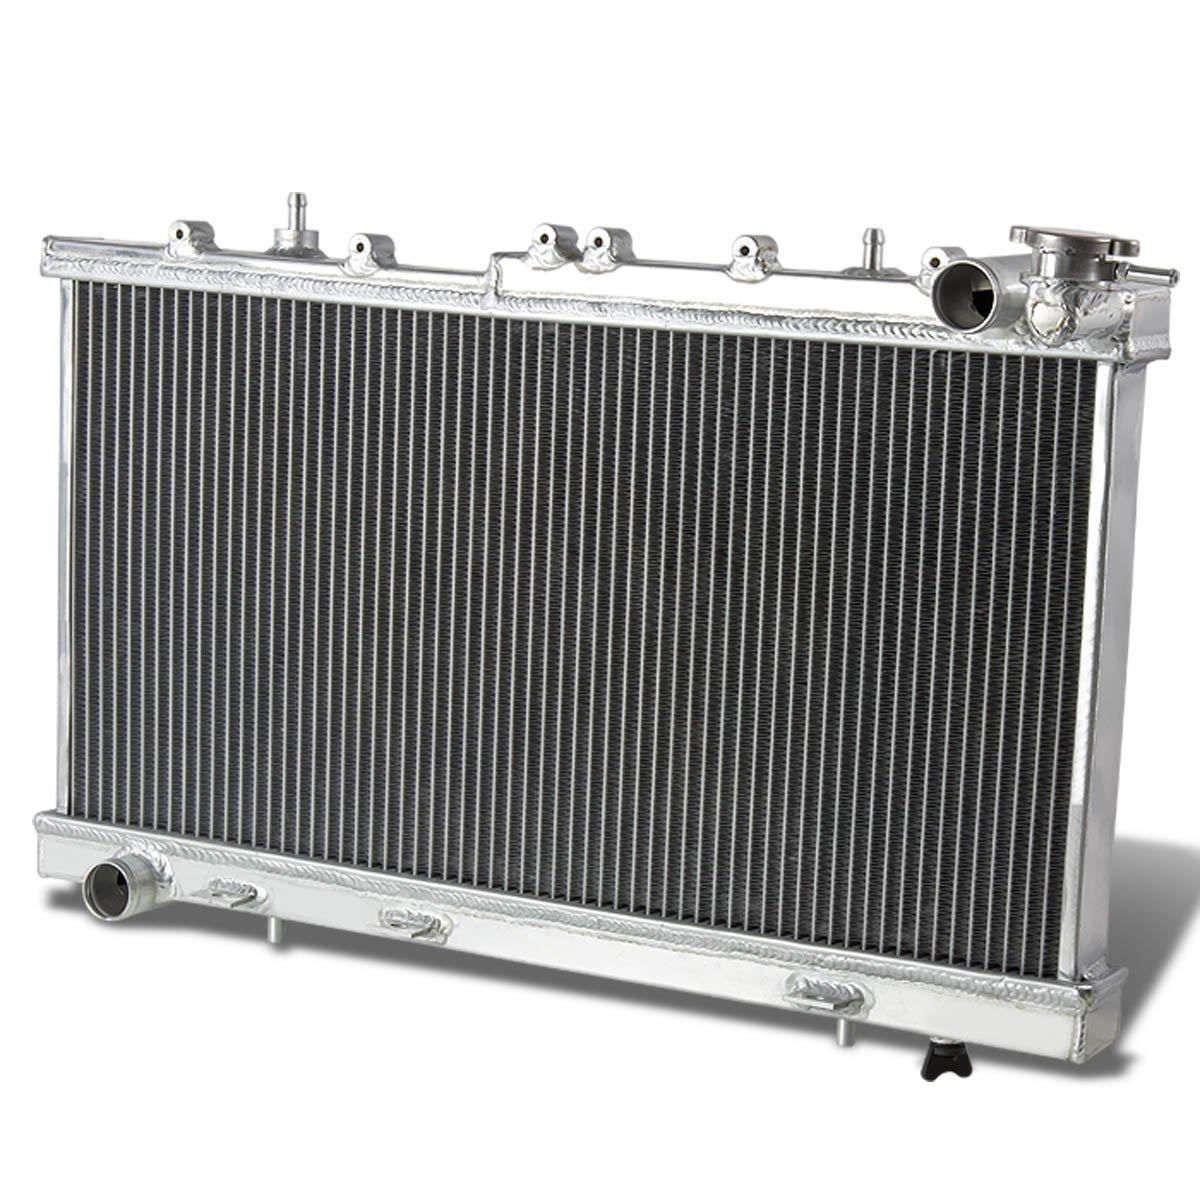 Amazon.com: For Nissan Sentra SE/SE-R Full Aluminum 2-Row Racing Radiator - B13  B14 2.0L SR20: Automotive